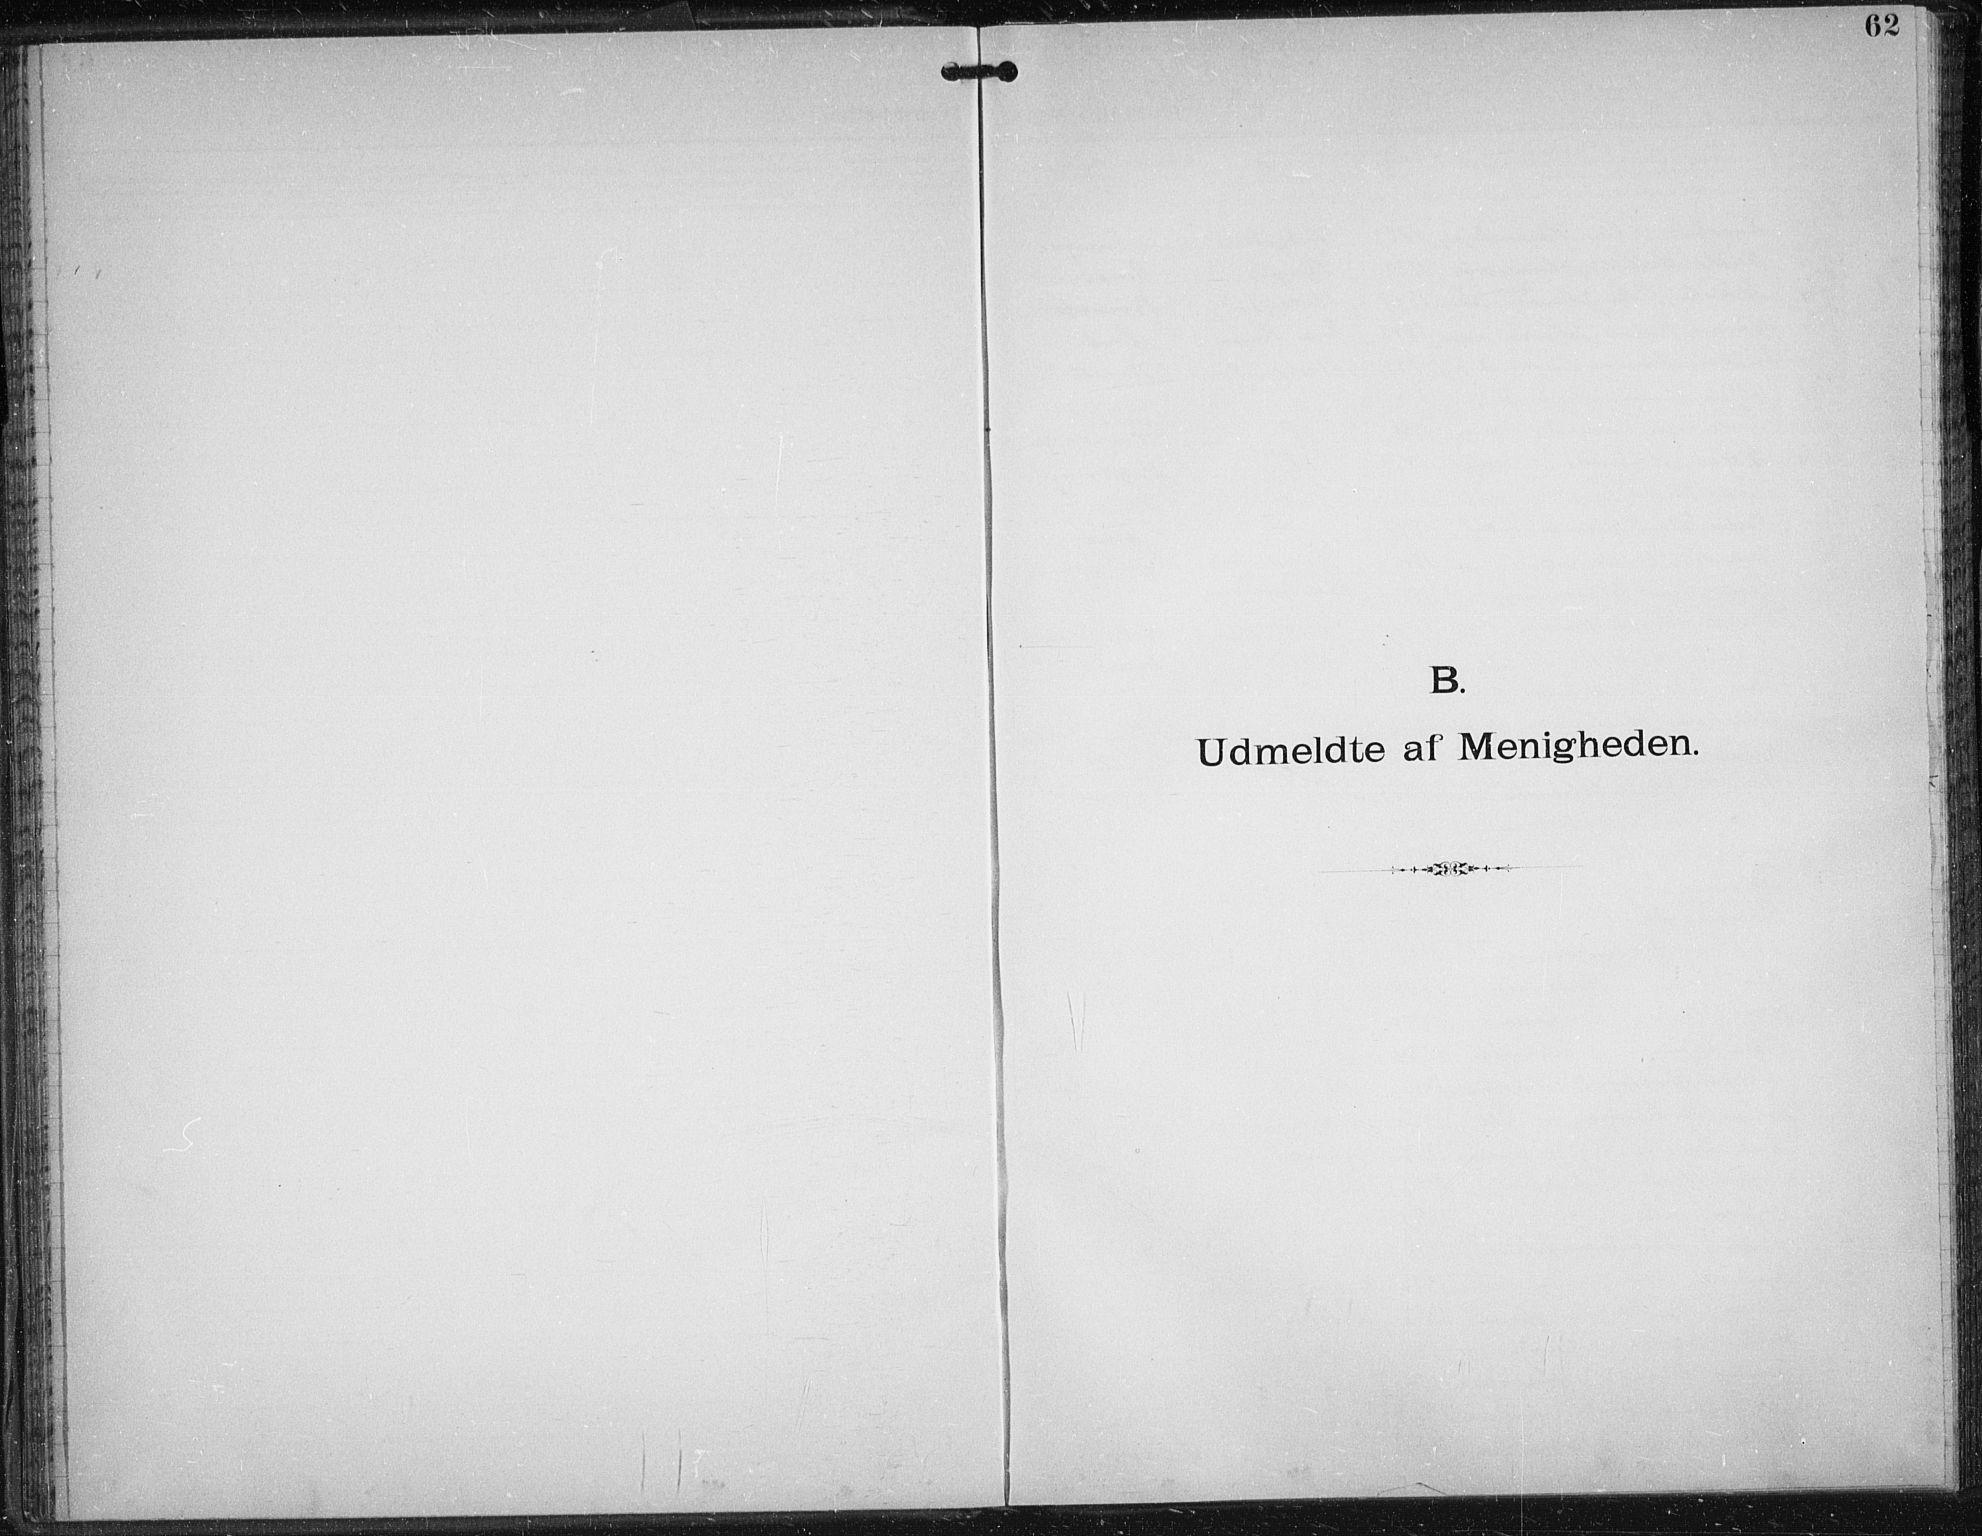 SATØ, Fylkesmannen i Troms, A7.10.1/L1975: Dissenterprotokoll nr. TF 1975, 1893-1936, s. 62